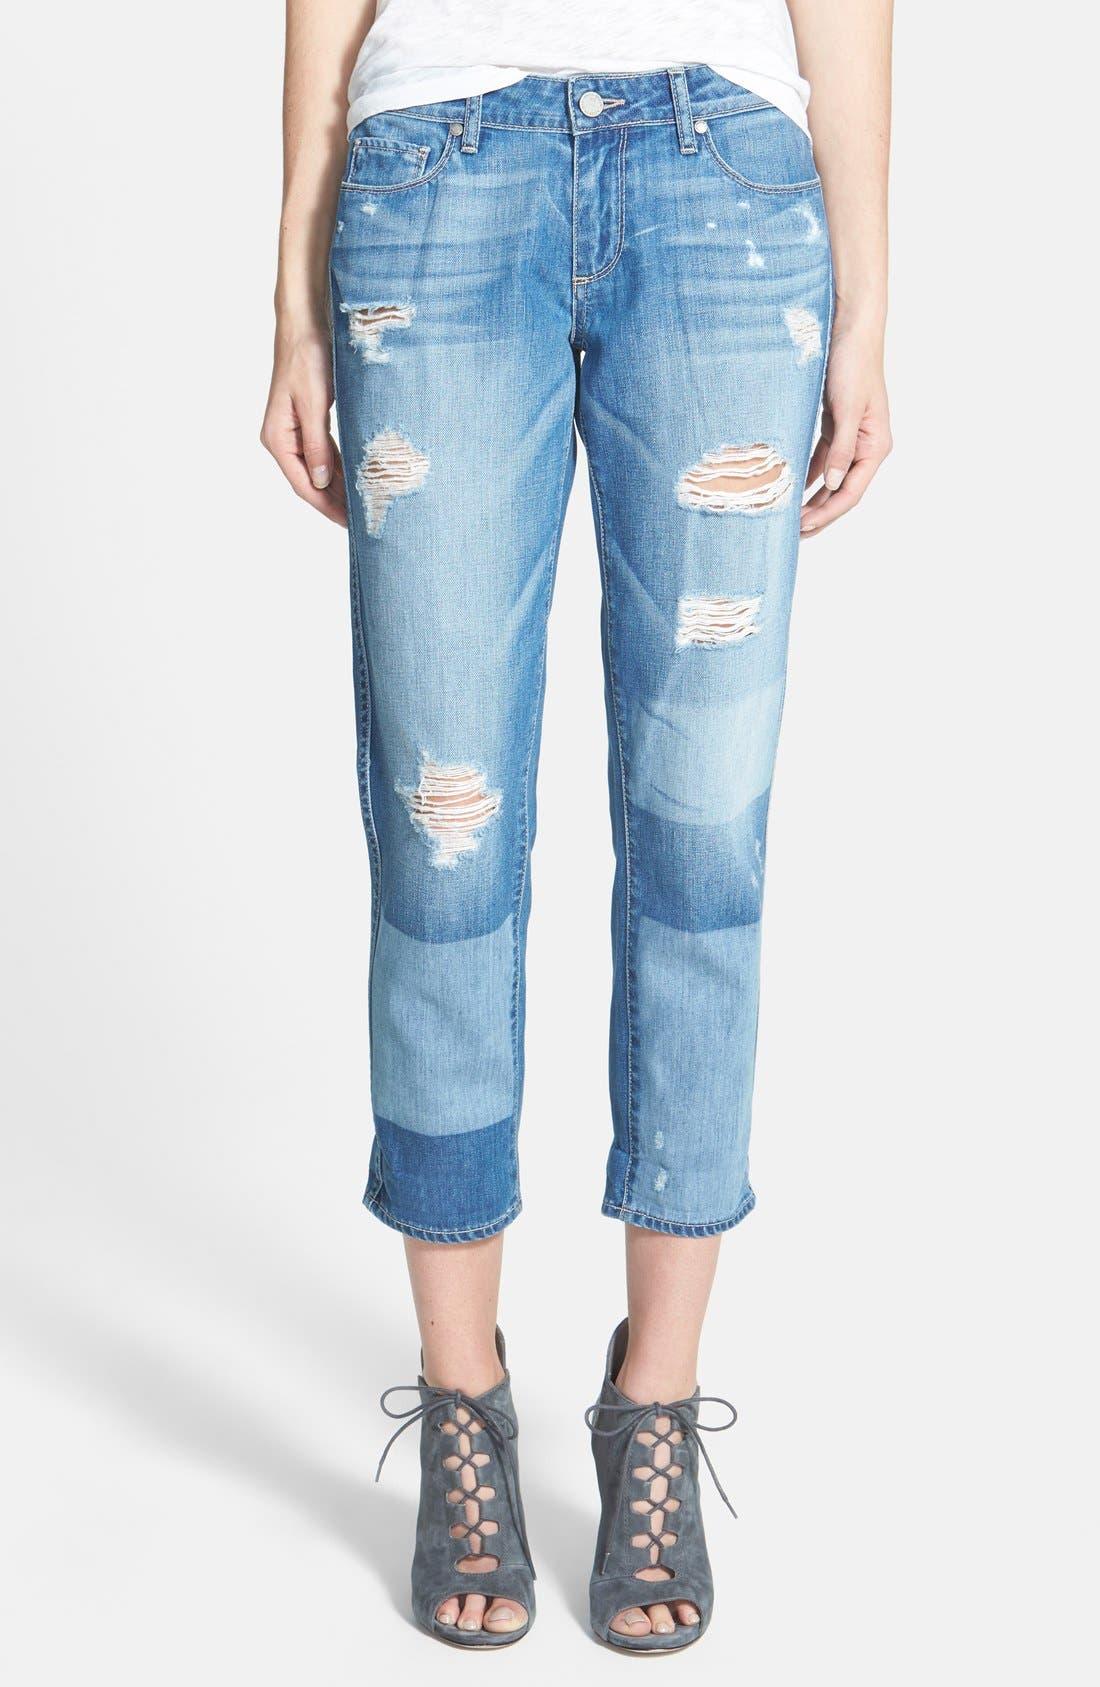 Alternate Image 1 Selected - Paige Denim 'Jimmy Jimmy' Crop Skinny Boyfriend Jeans (Indigo Ezra Destroyed)